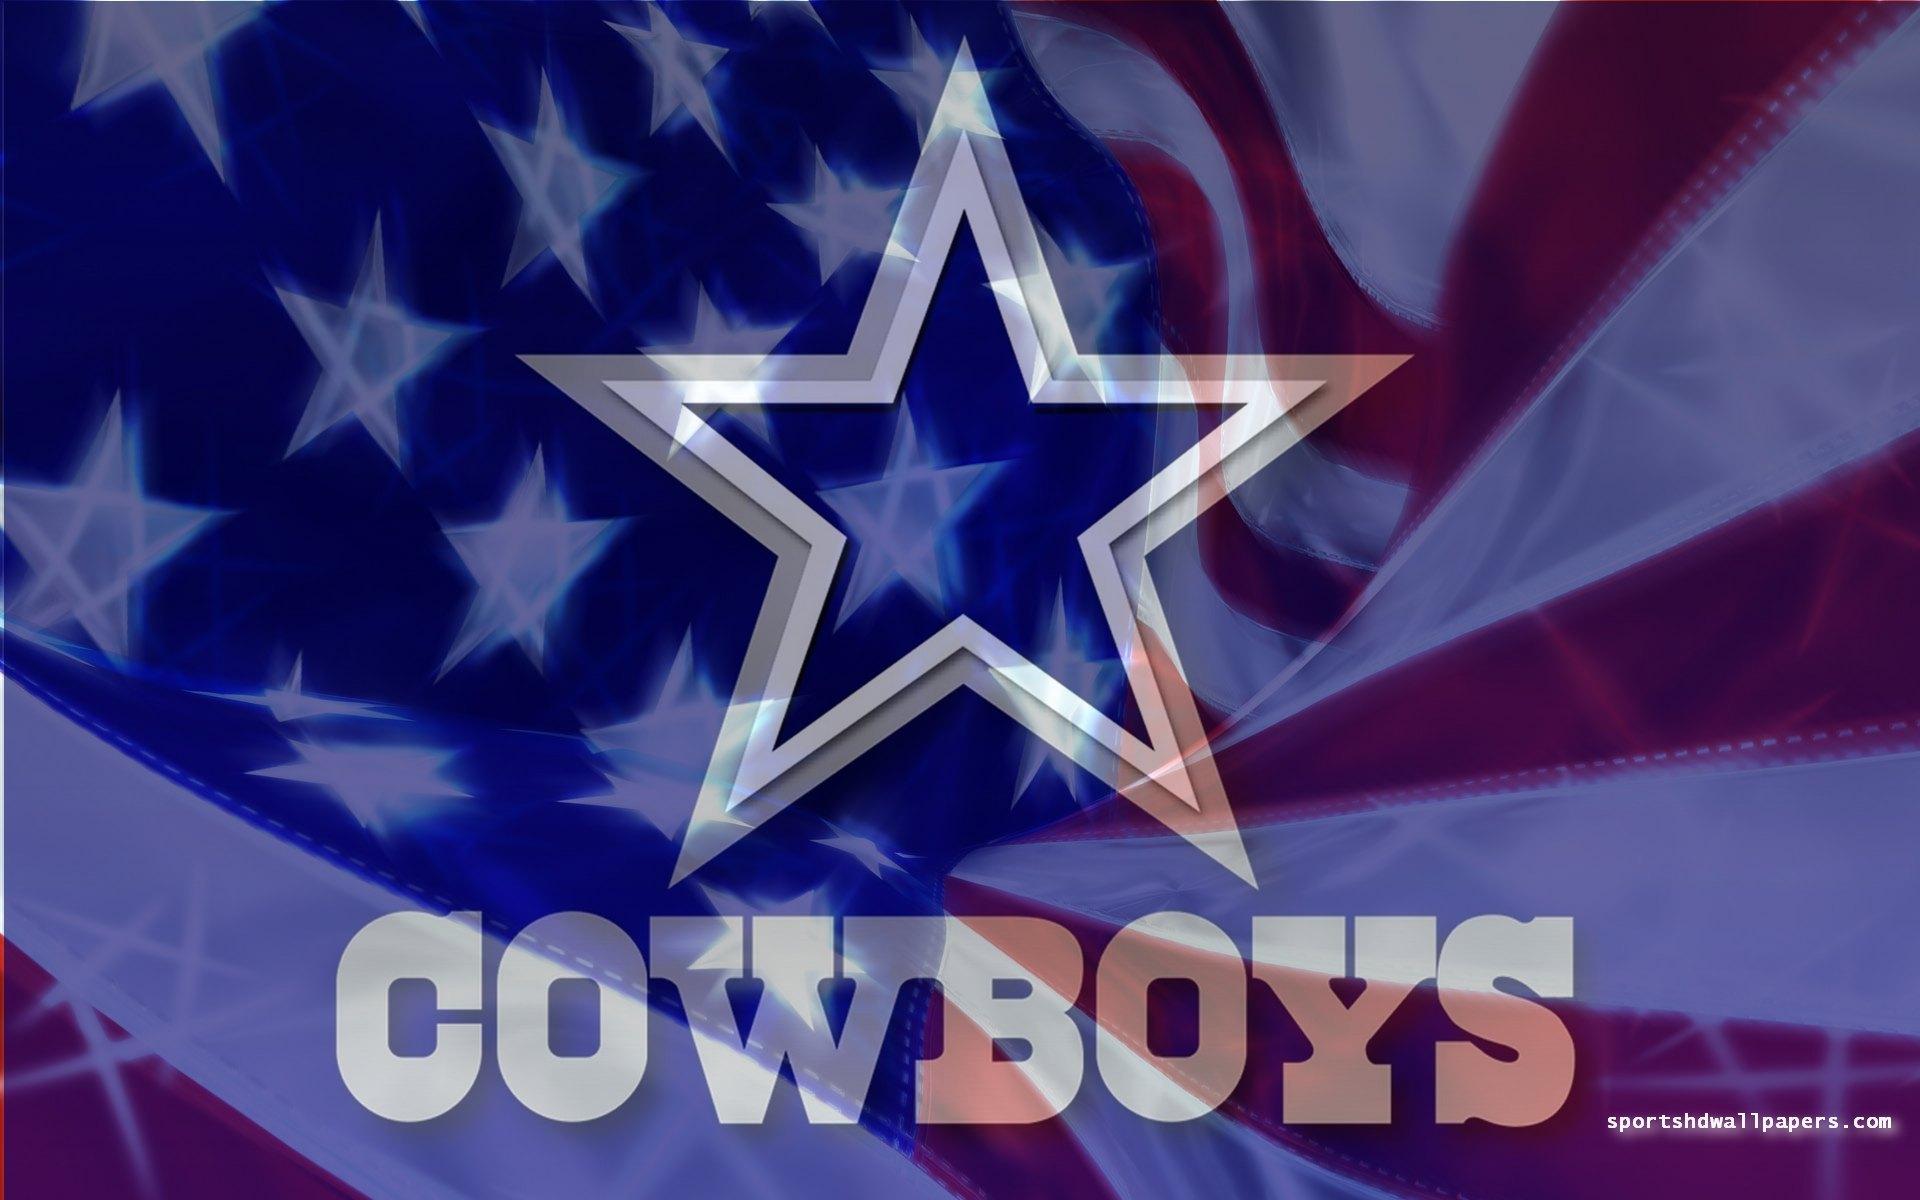 Dallas Cowboys Nfl 1920x1200 Wide Images   top downloads page 1 1920x1200